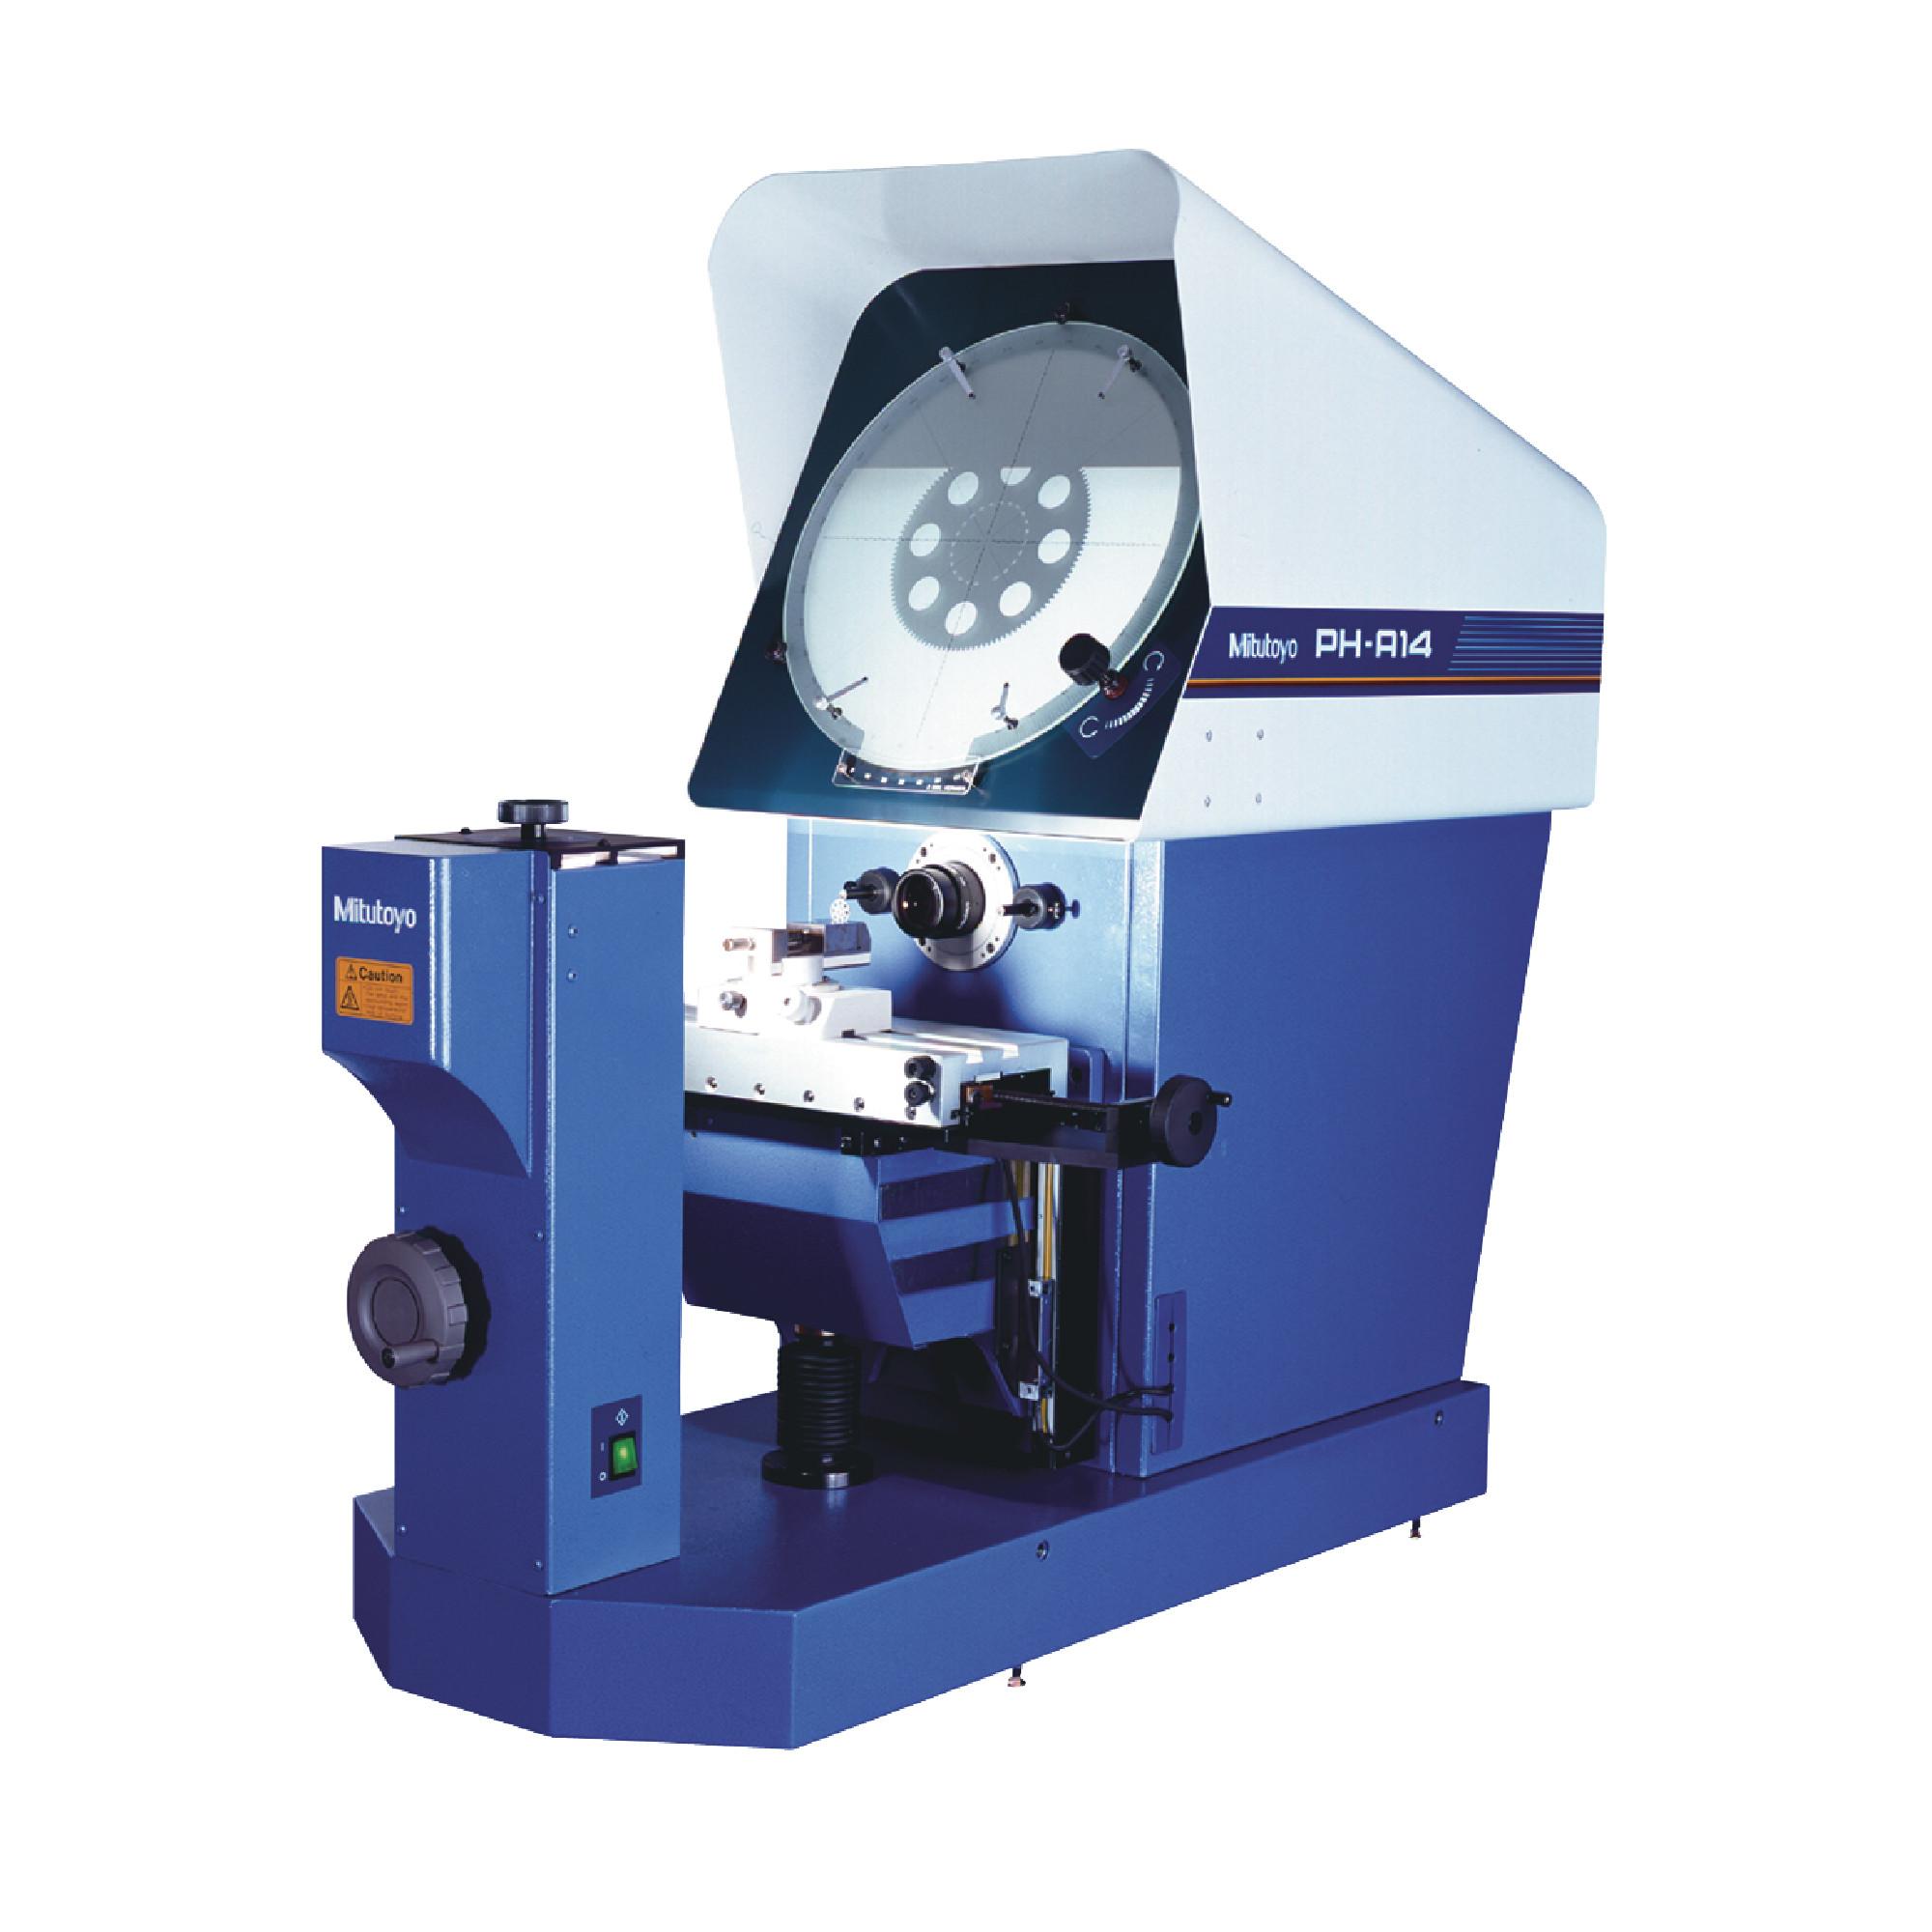 PH-A14 Optical Comparator